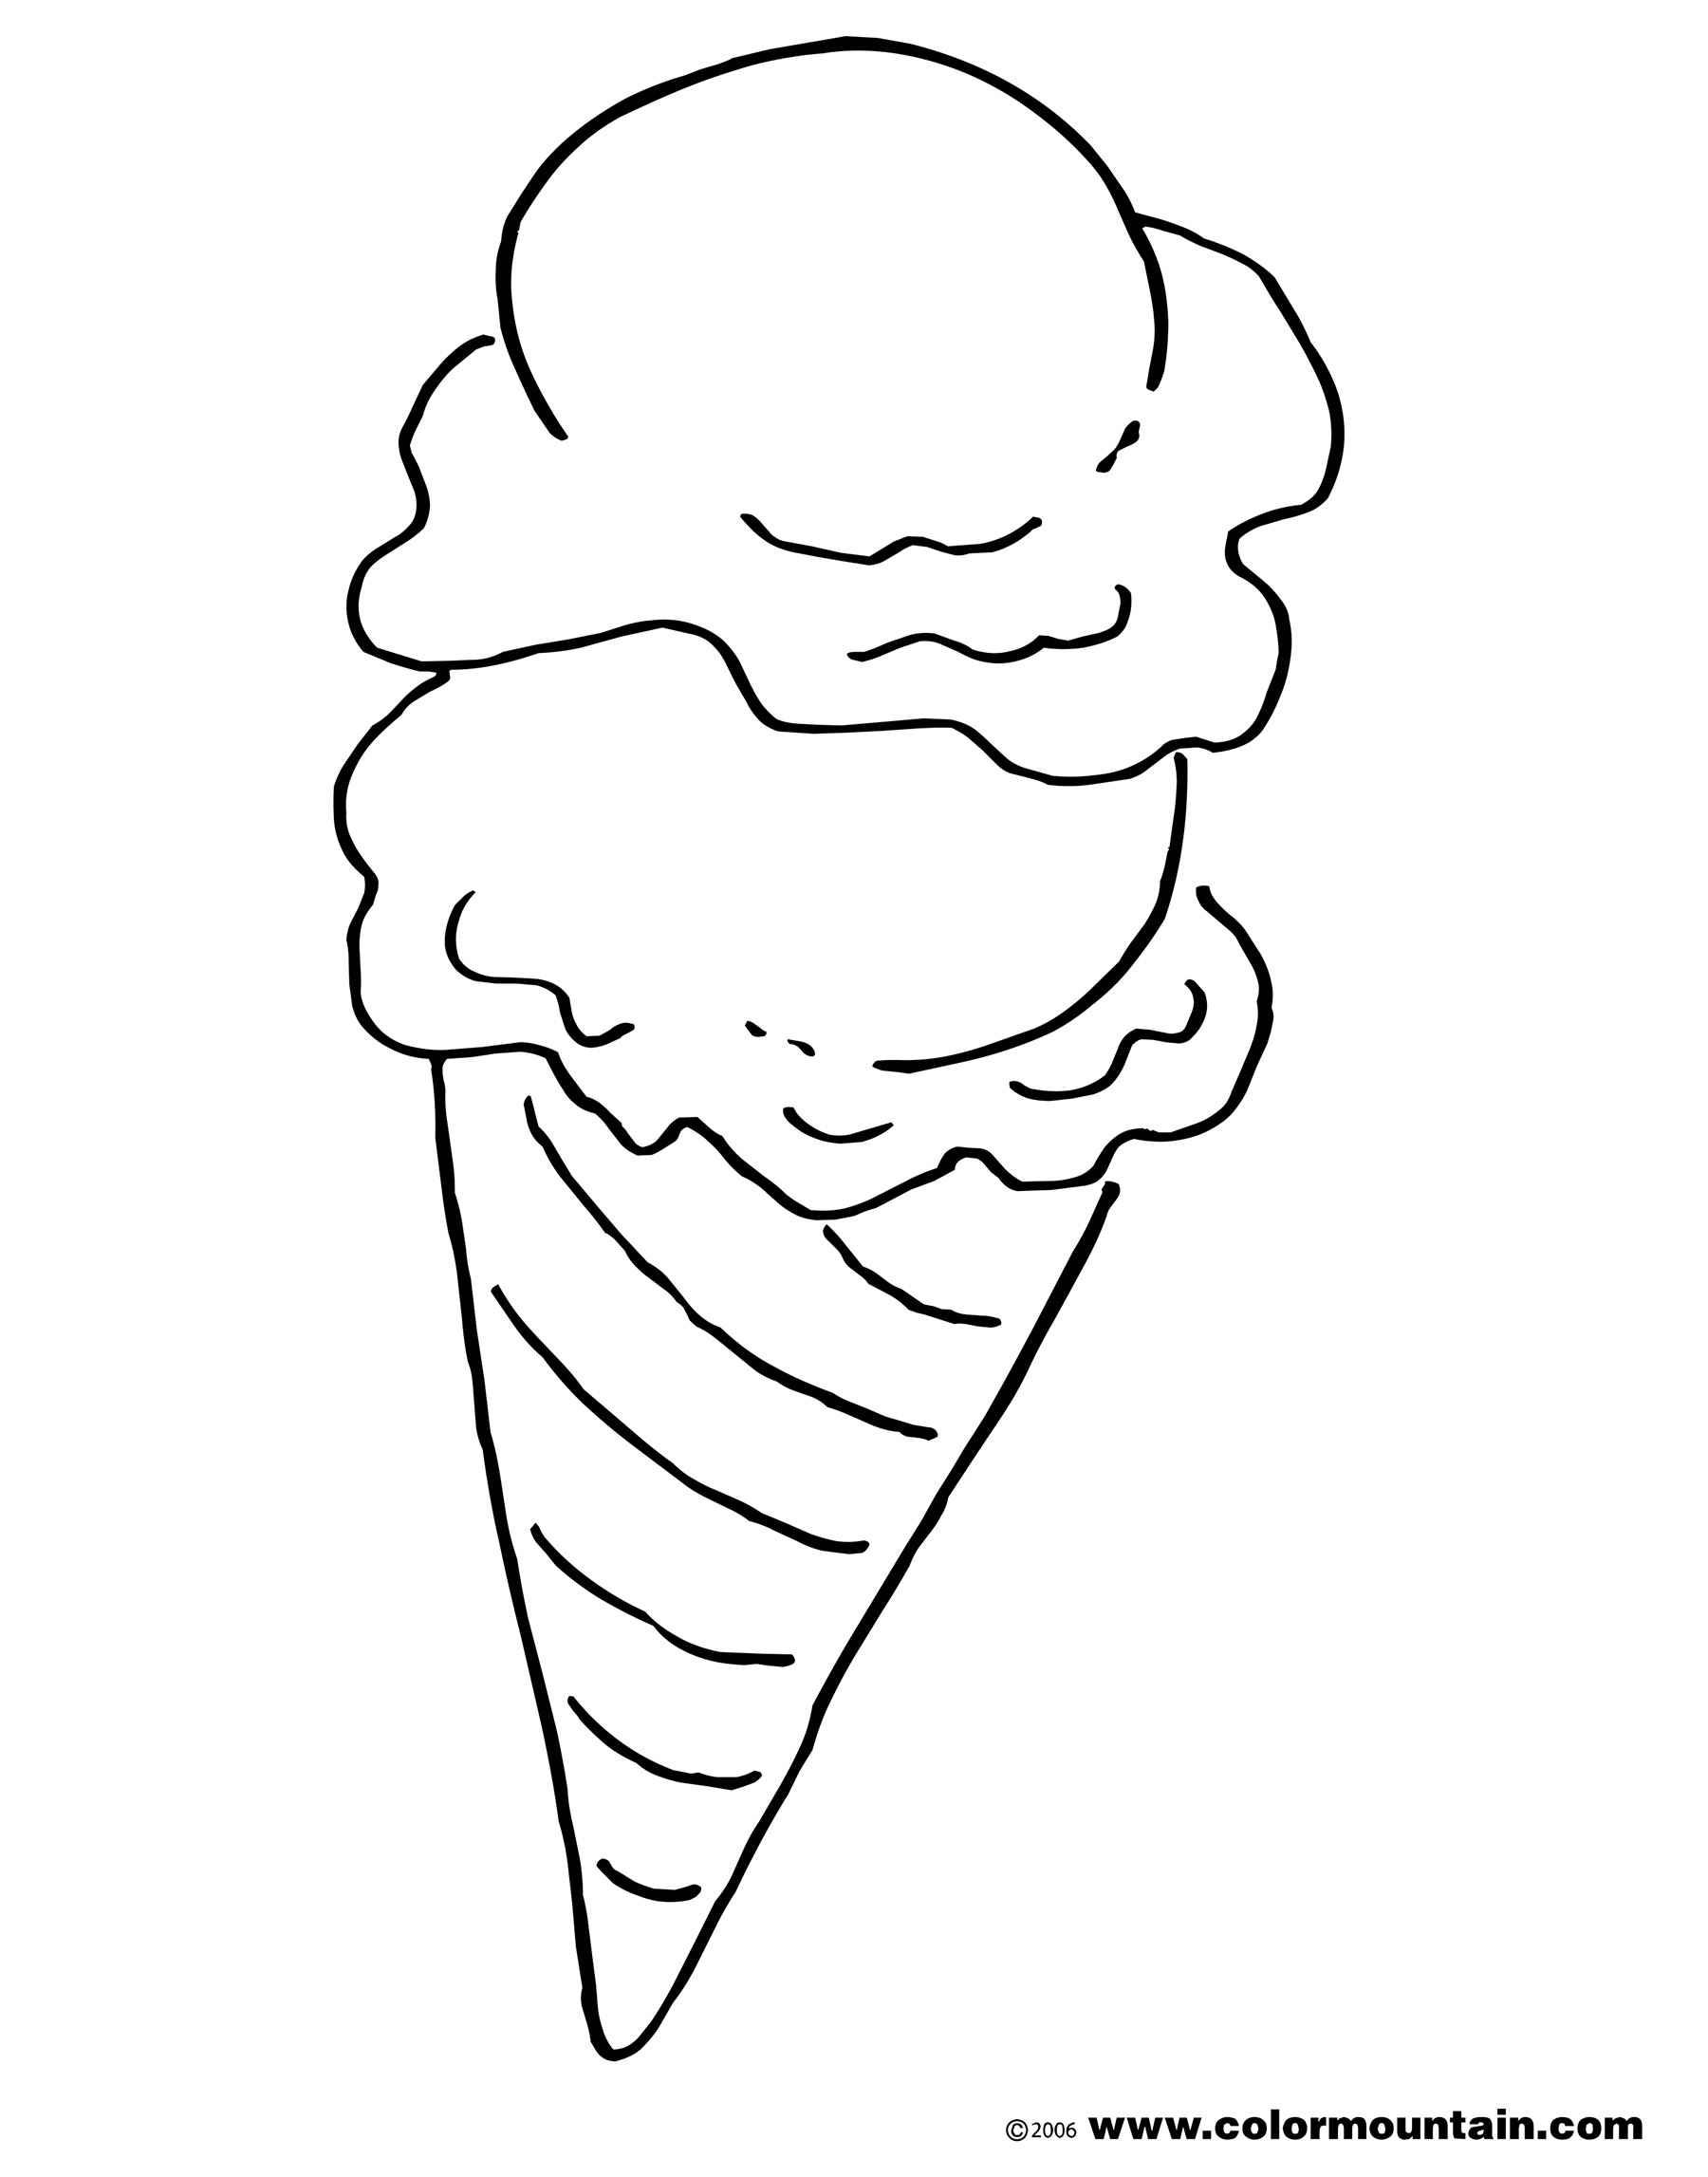 ice cream cone coloring pictures